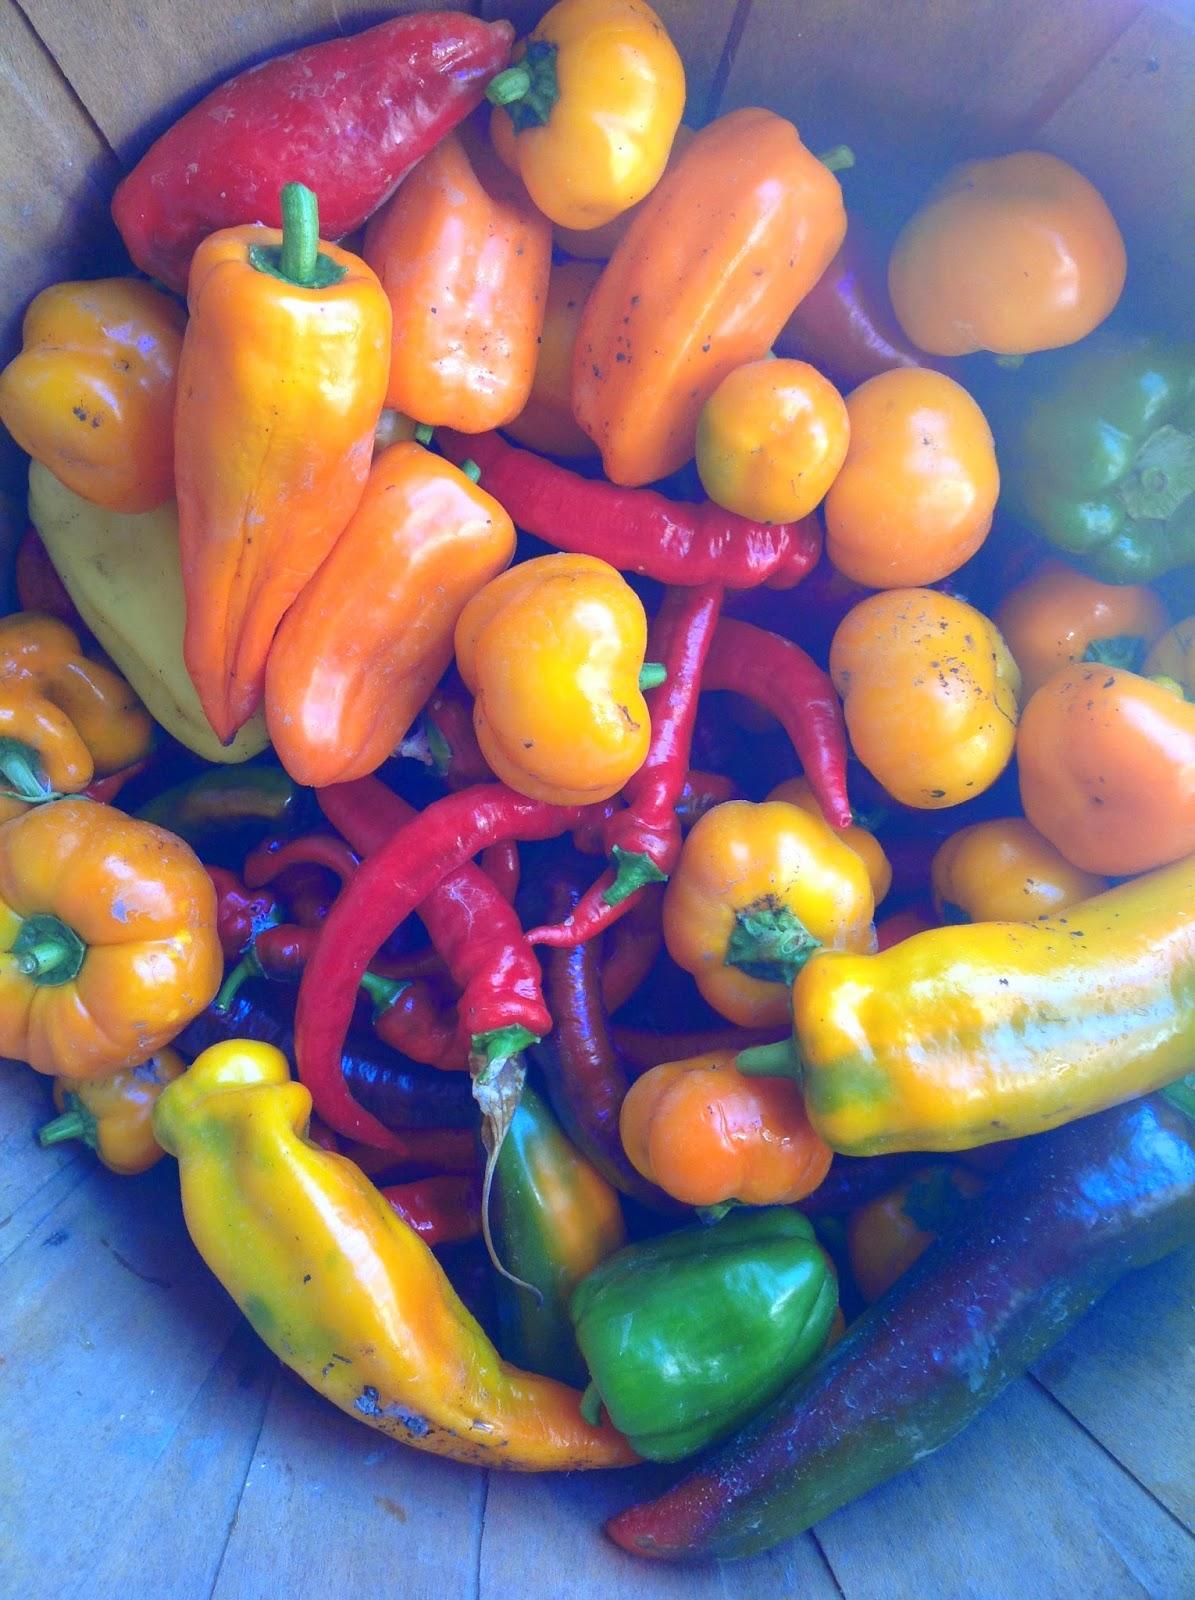 Chez Nous Farms- Certified Organic in Niagara: Looking ahead to 2018